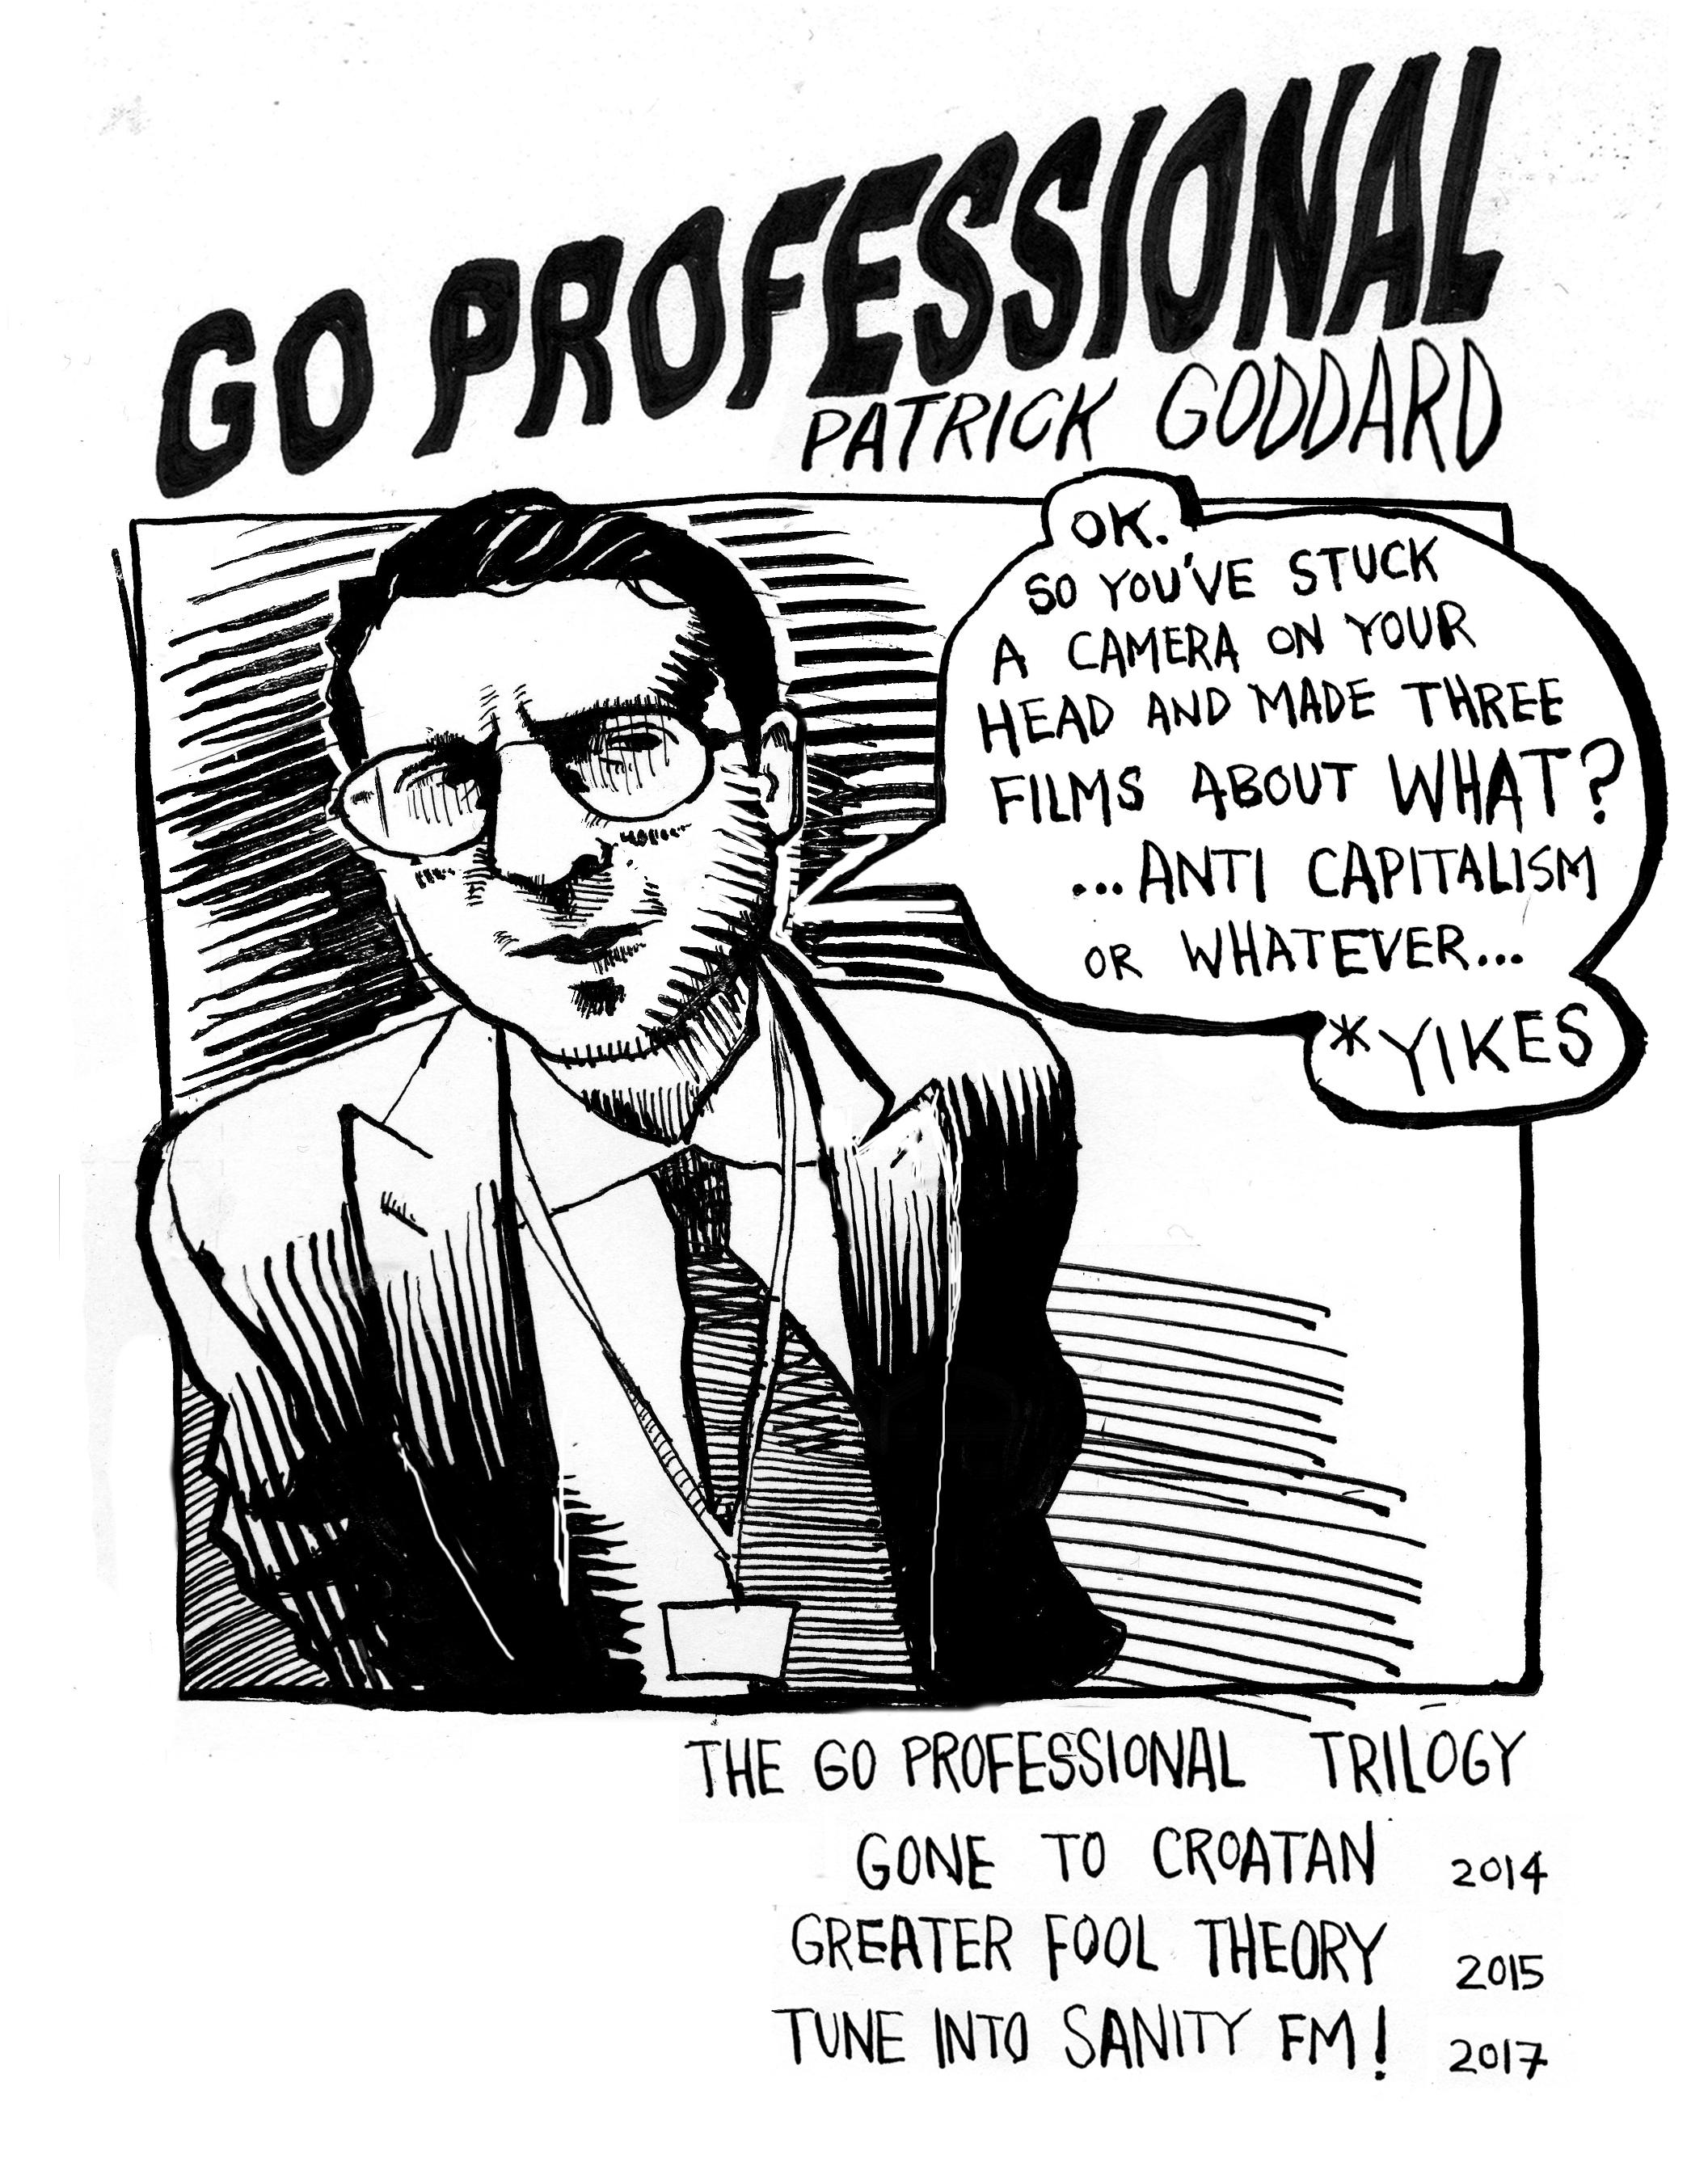 Patrick Goddard, Go Professional